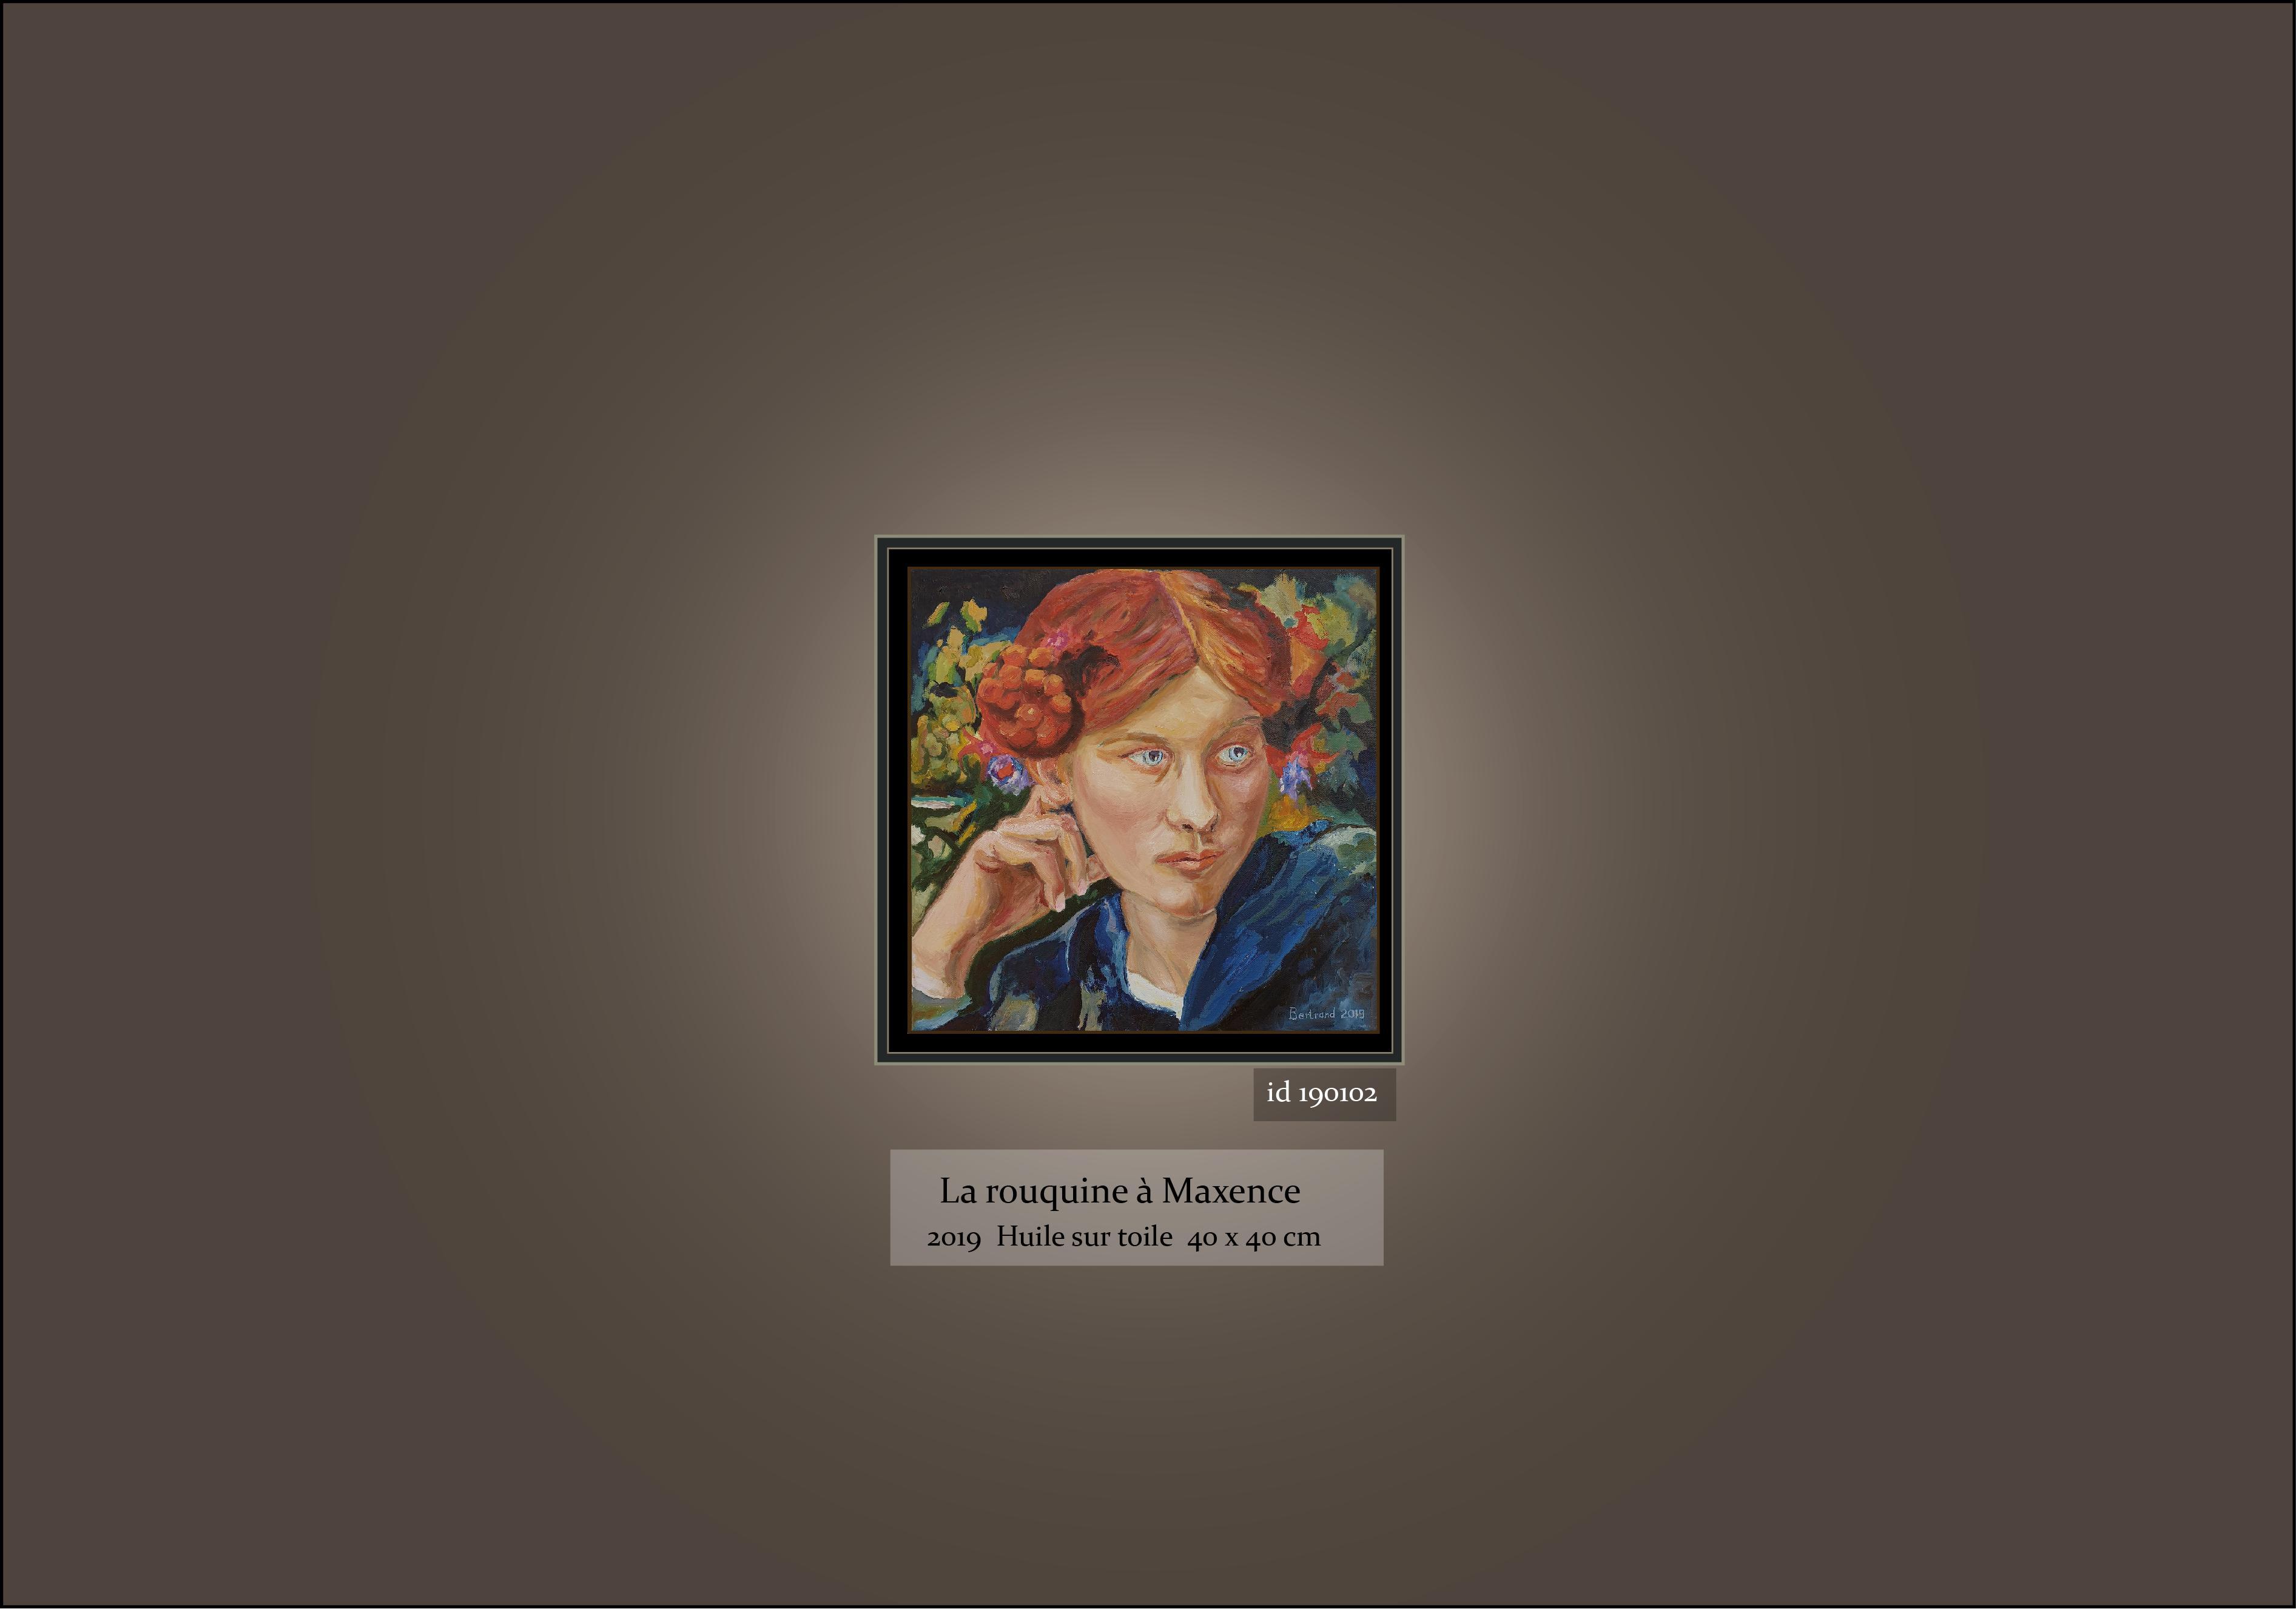 190102 LA ROUQUINE A MAXENCE